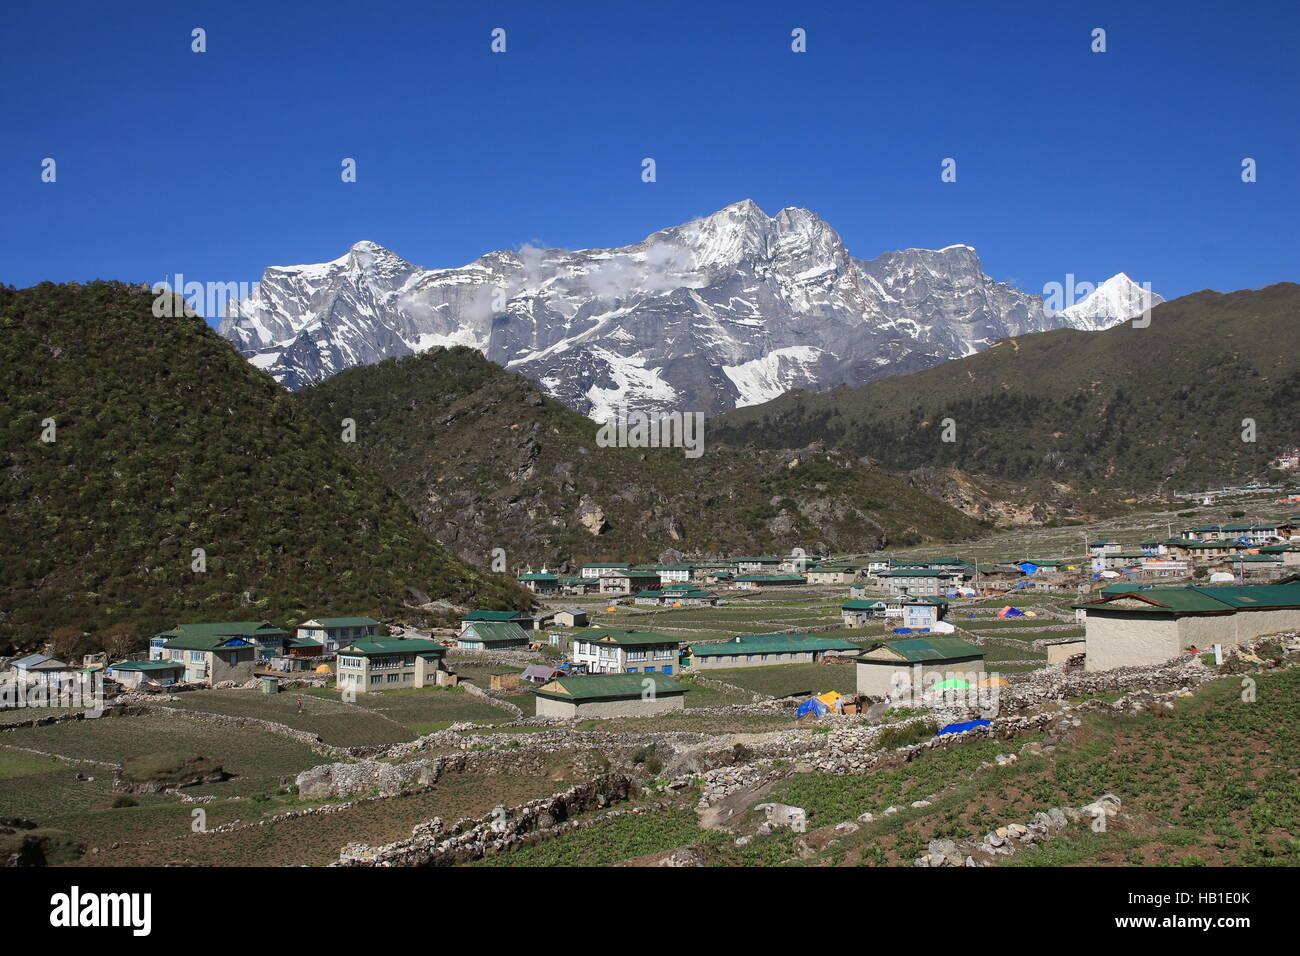 Village Khumjung and snow capped Kongde Ri - Stock Image